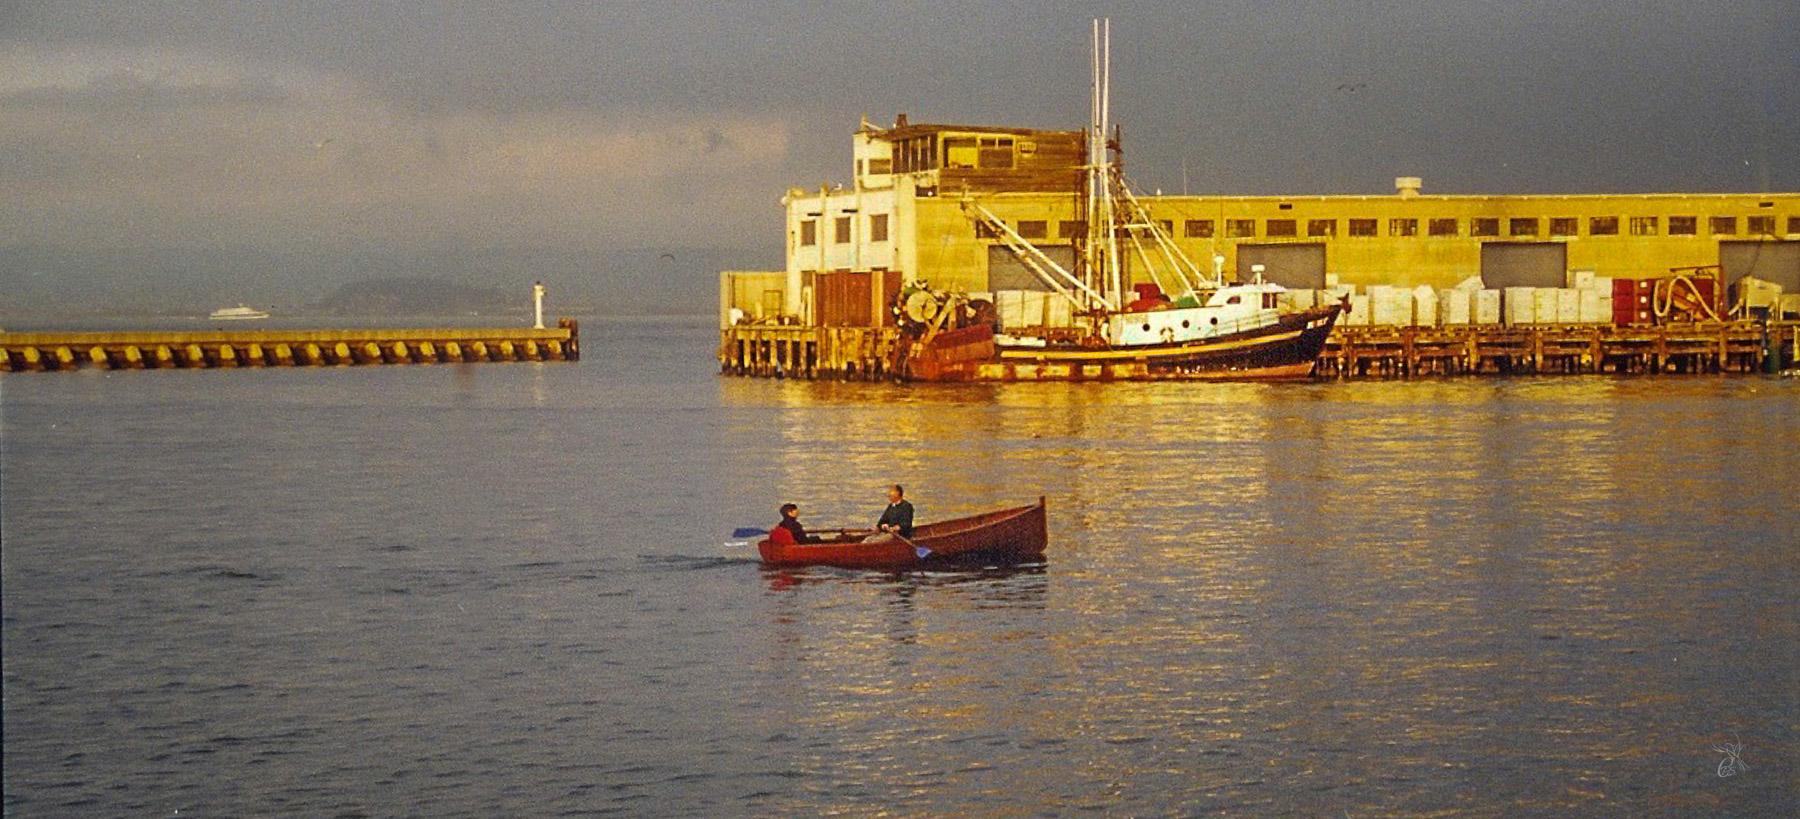 San Francisco: Harbor 1999